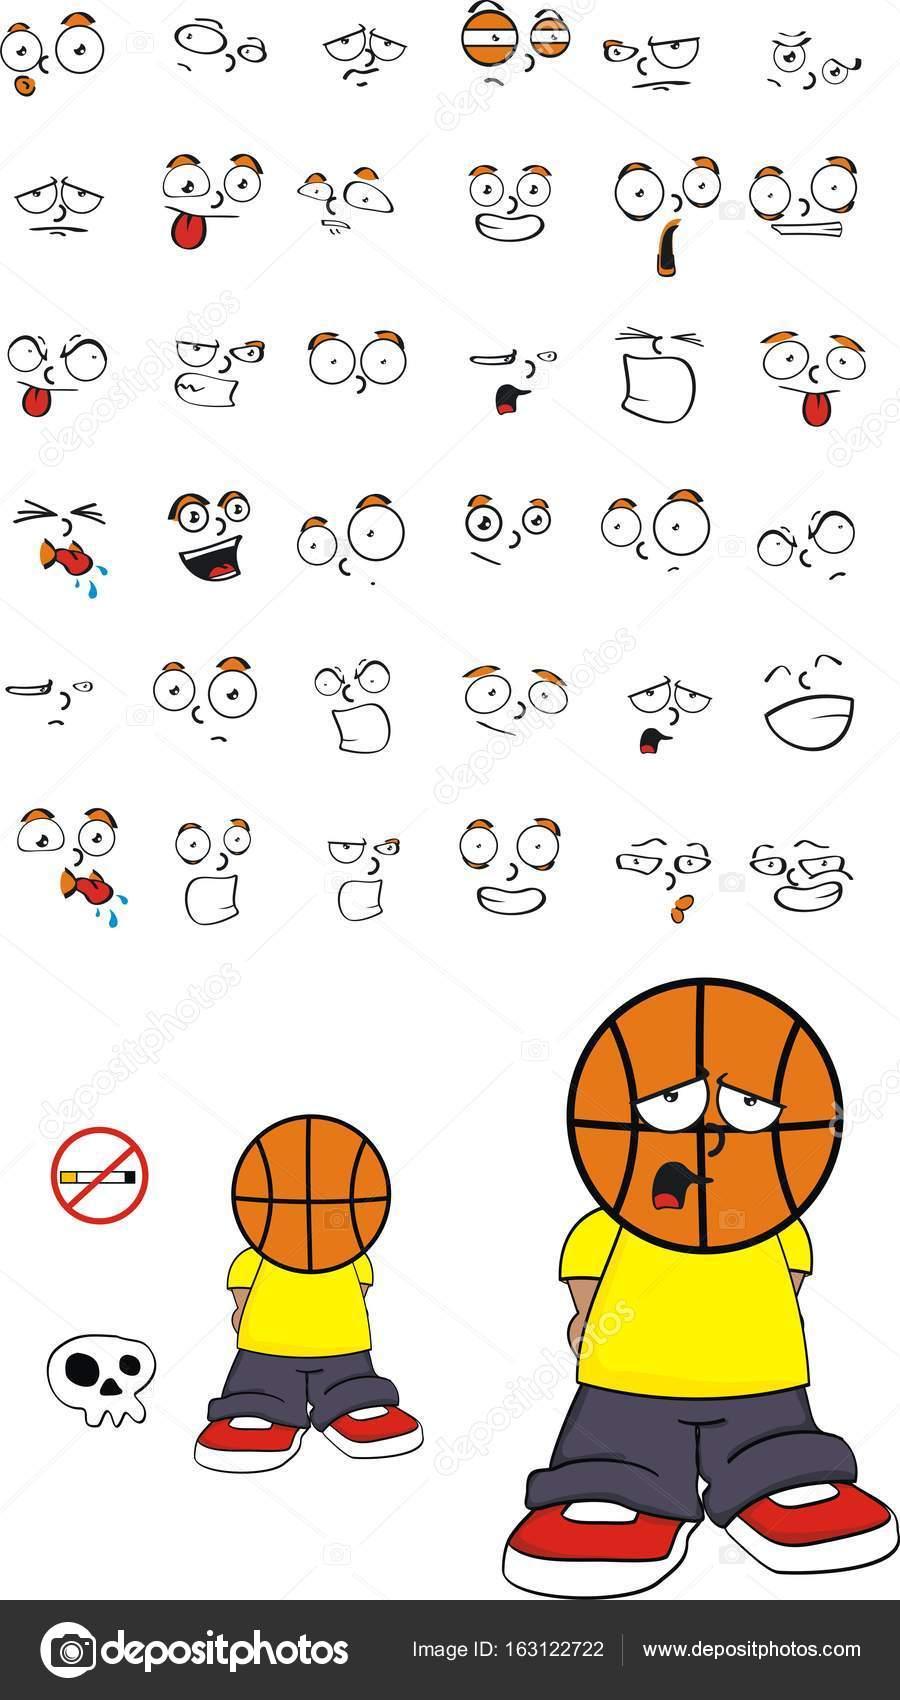 Dibujos Baloncesto Faciles Lindo Baloncesto Triste Cabeza